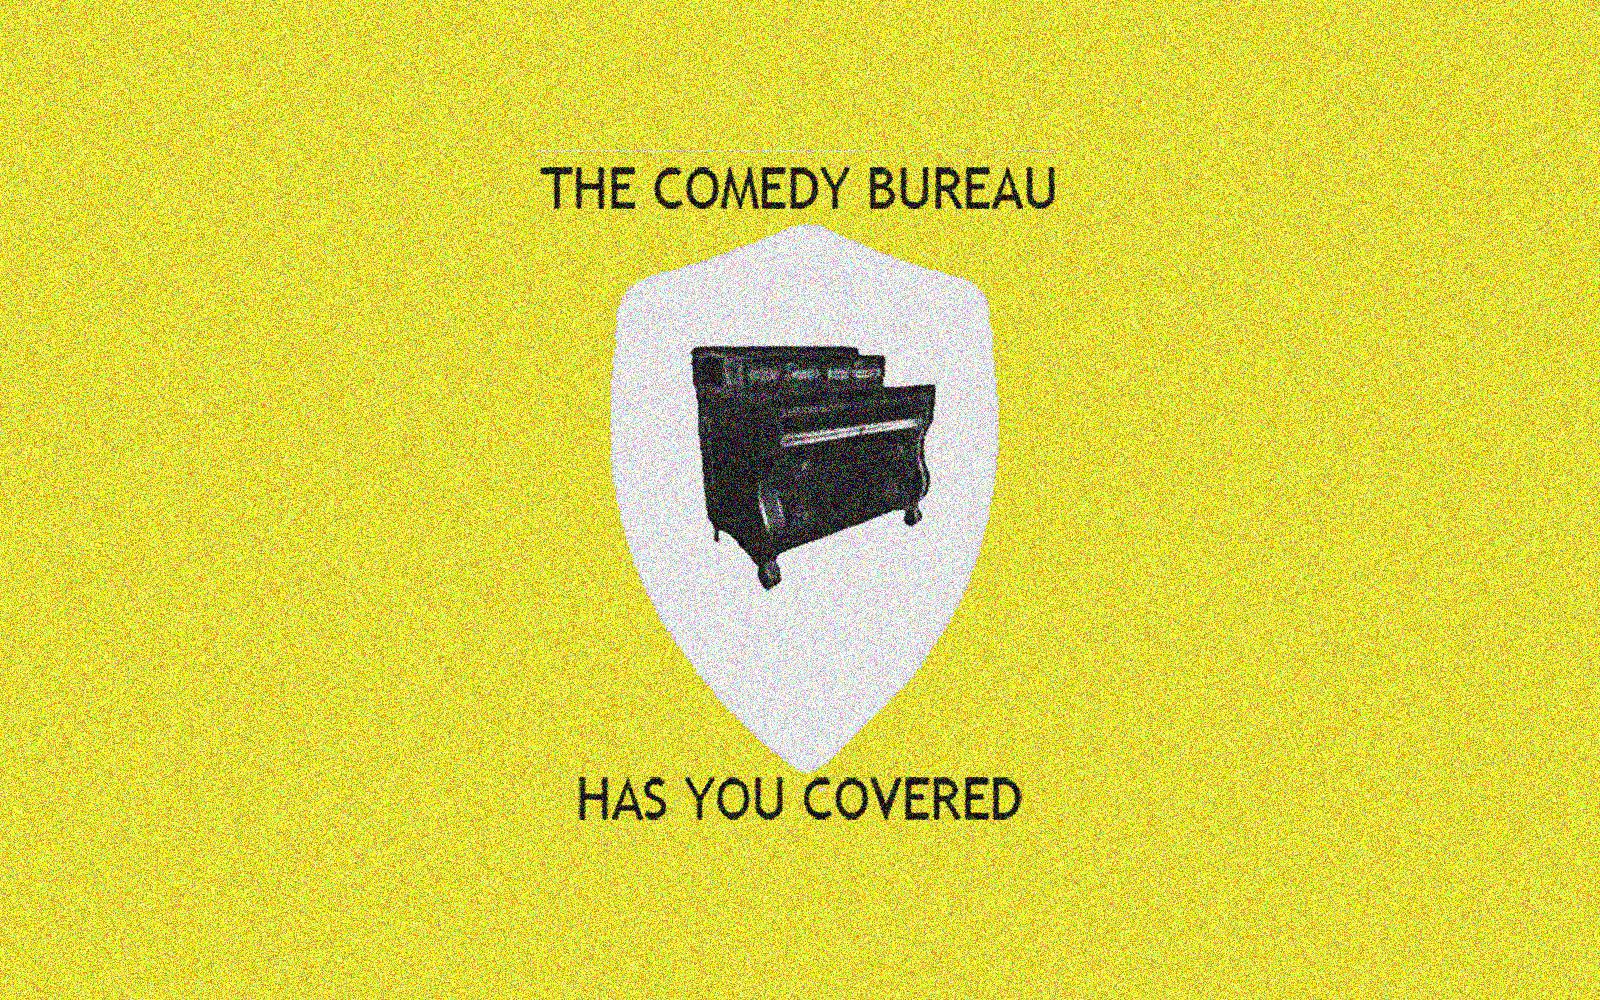 cb_logo-1600x10001